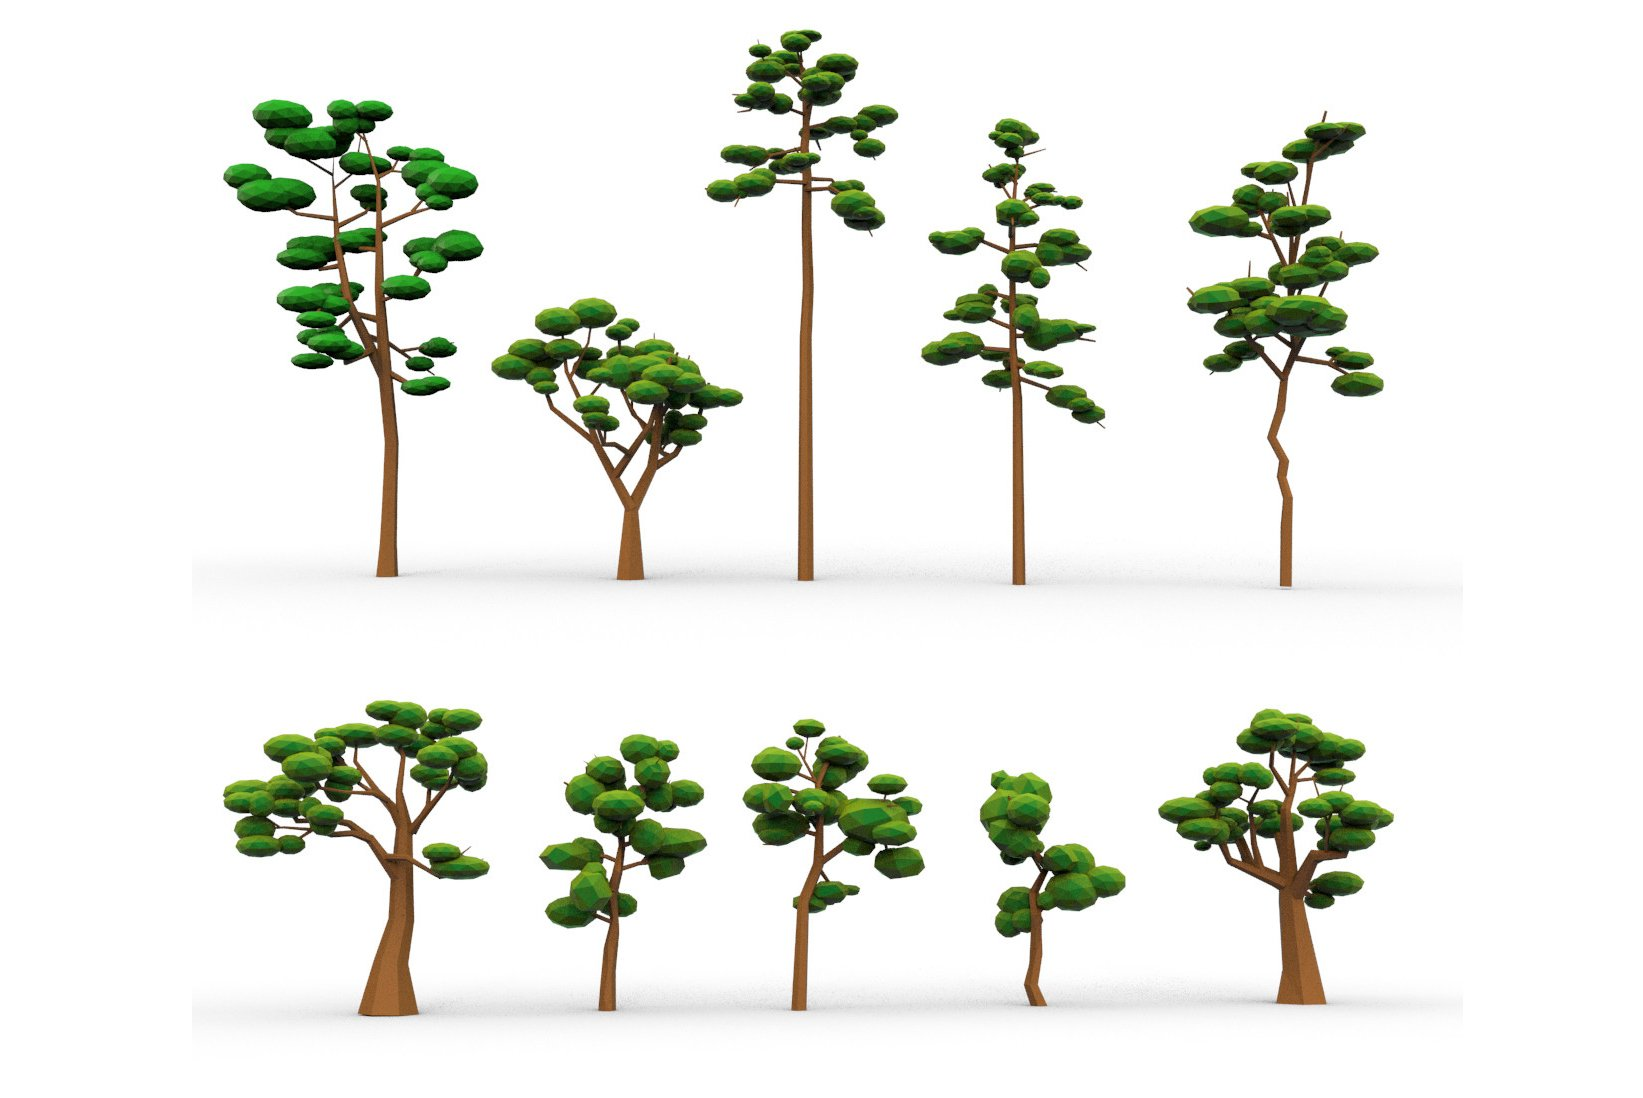 10 Low Poly Cartoon Tree